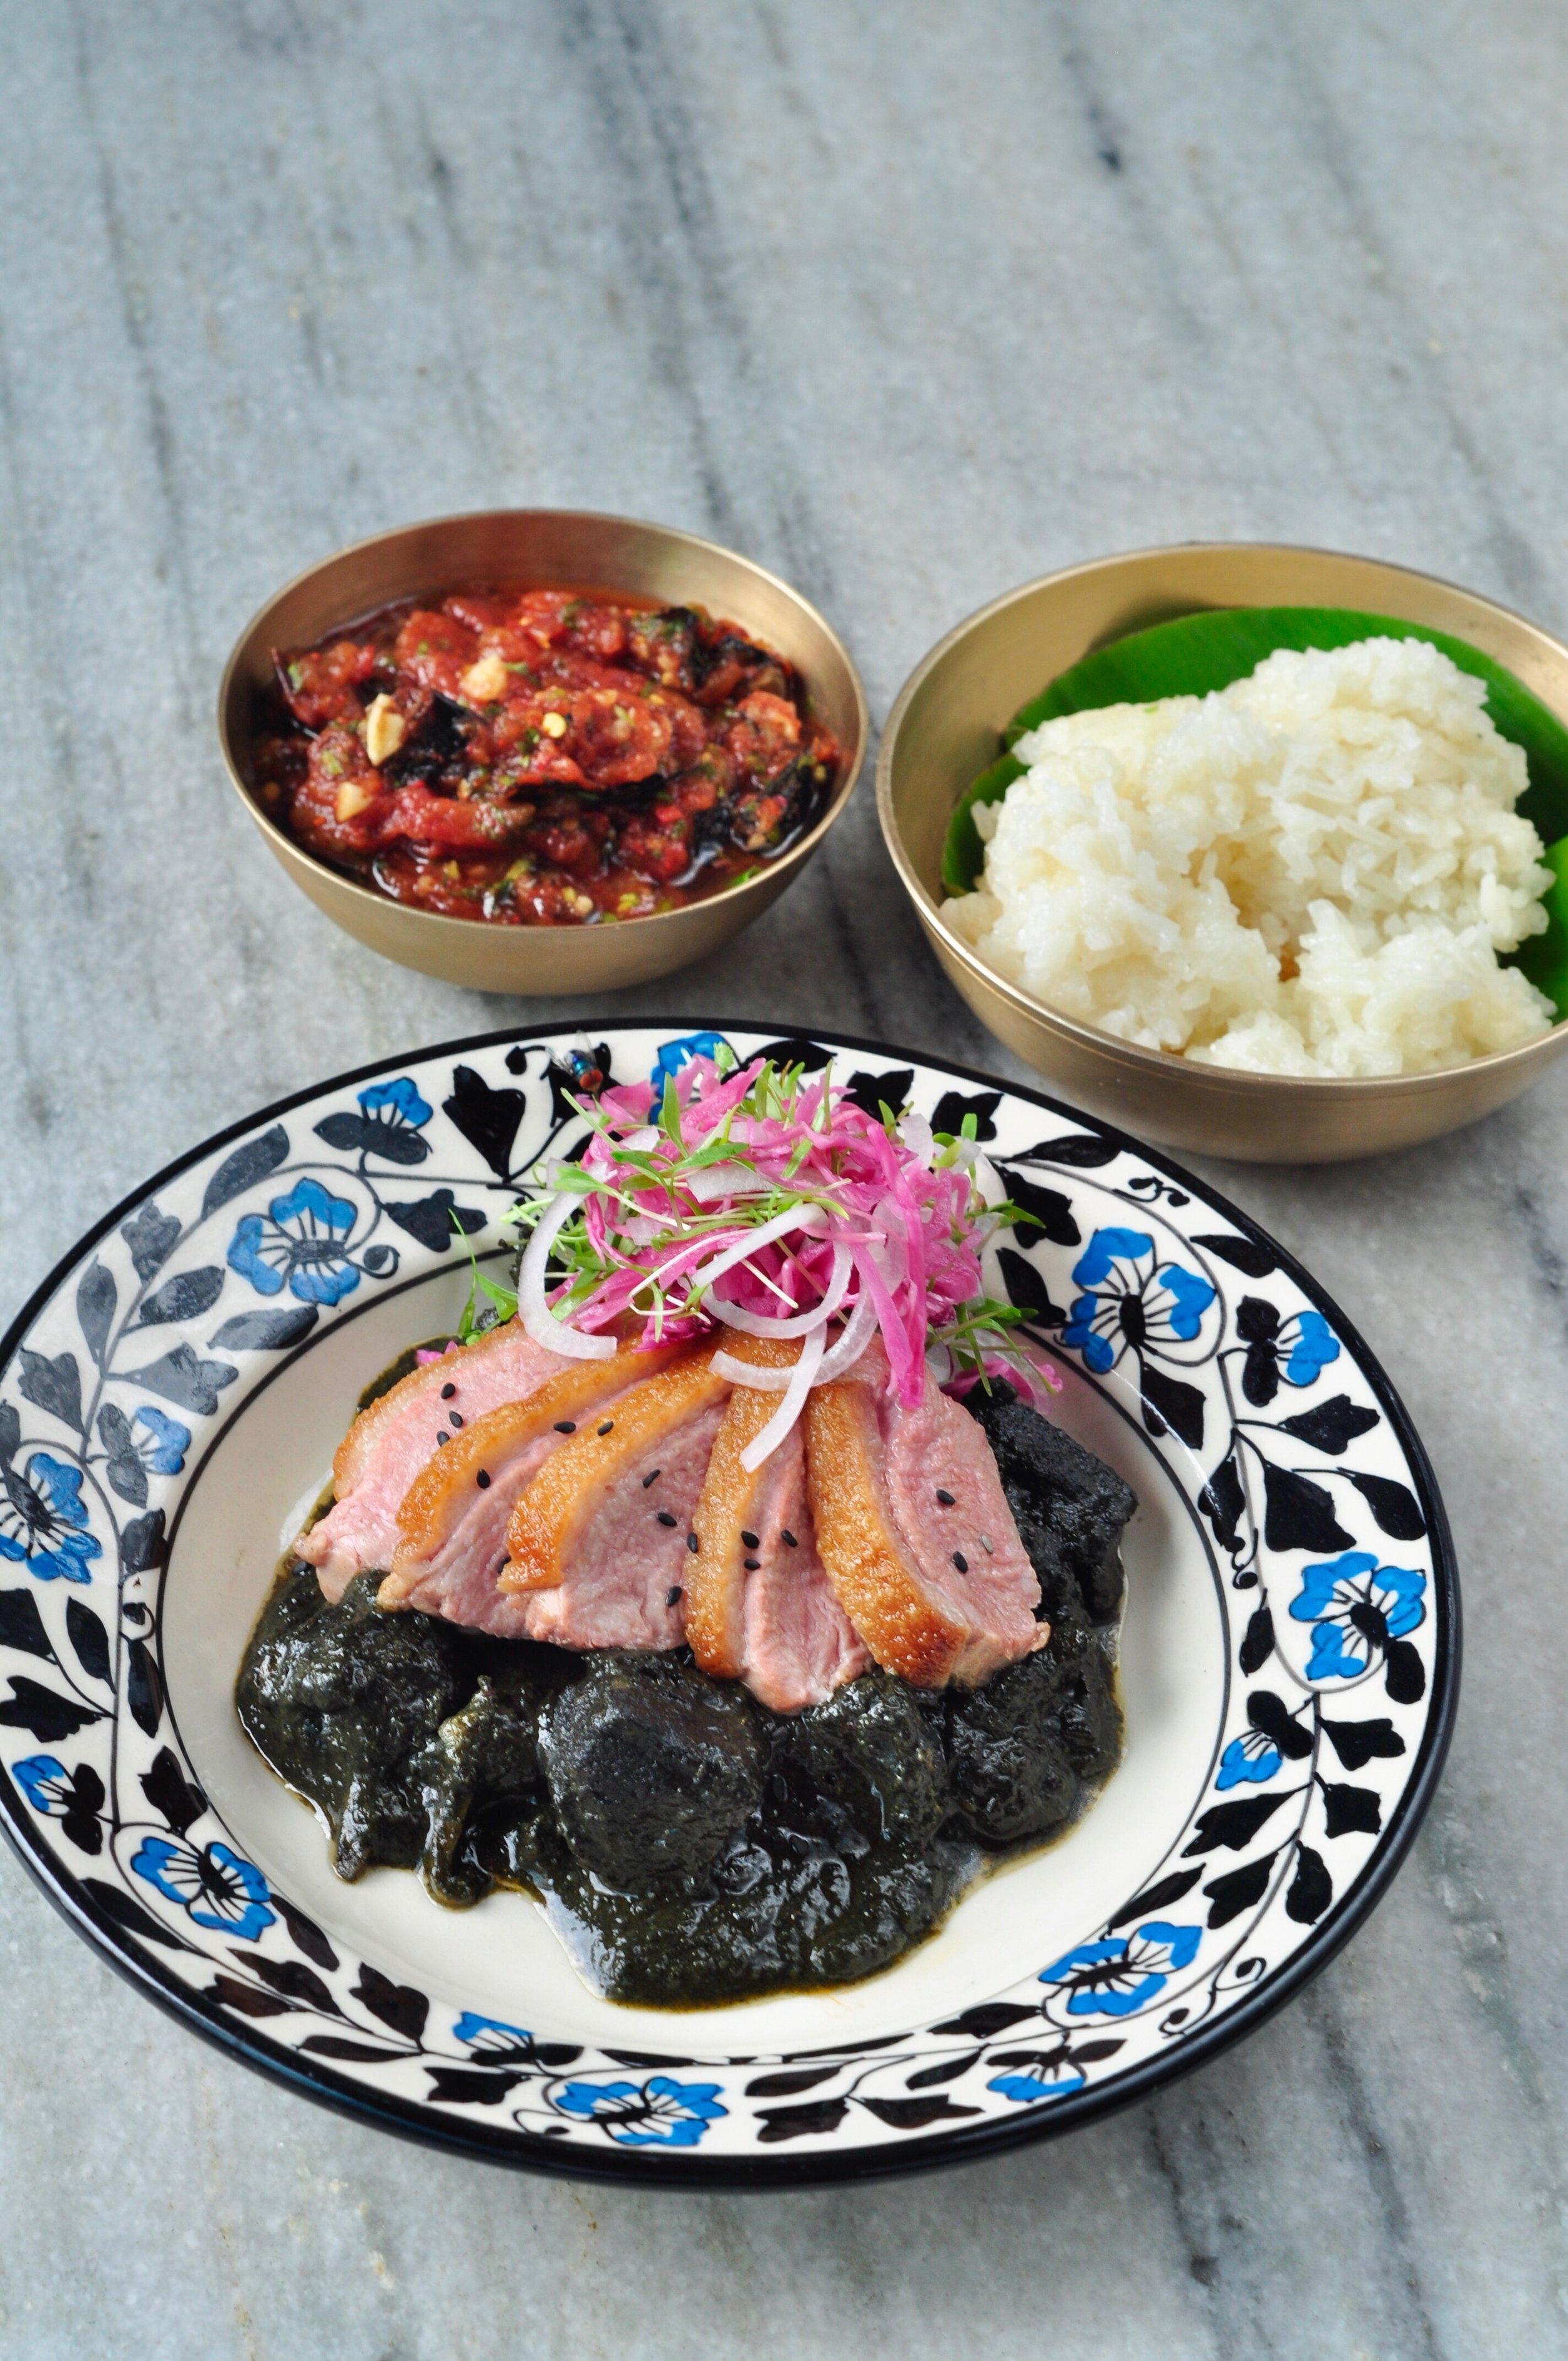 Meghalayan Black Sesame Duck_The Bombay Canteen_By Heena Punwani.JPG